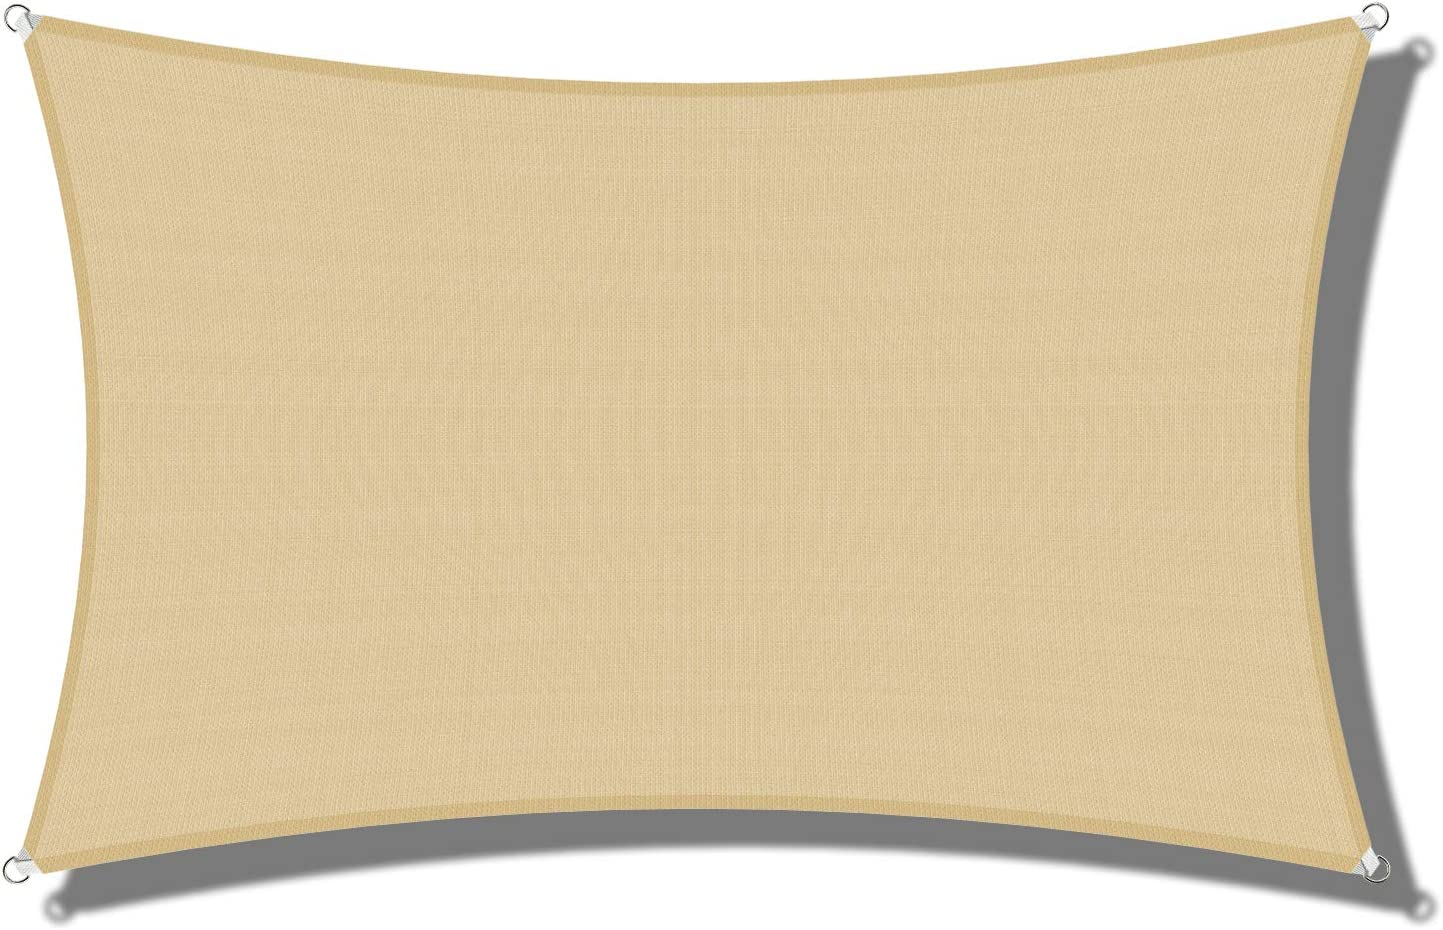 COARBOR Sun Shade Sail 5 ☆ popular Square Rectangle Max 43% OFF Block –UV Canopy UV Resi